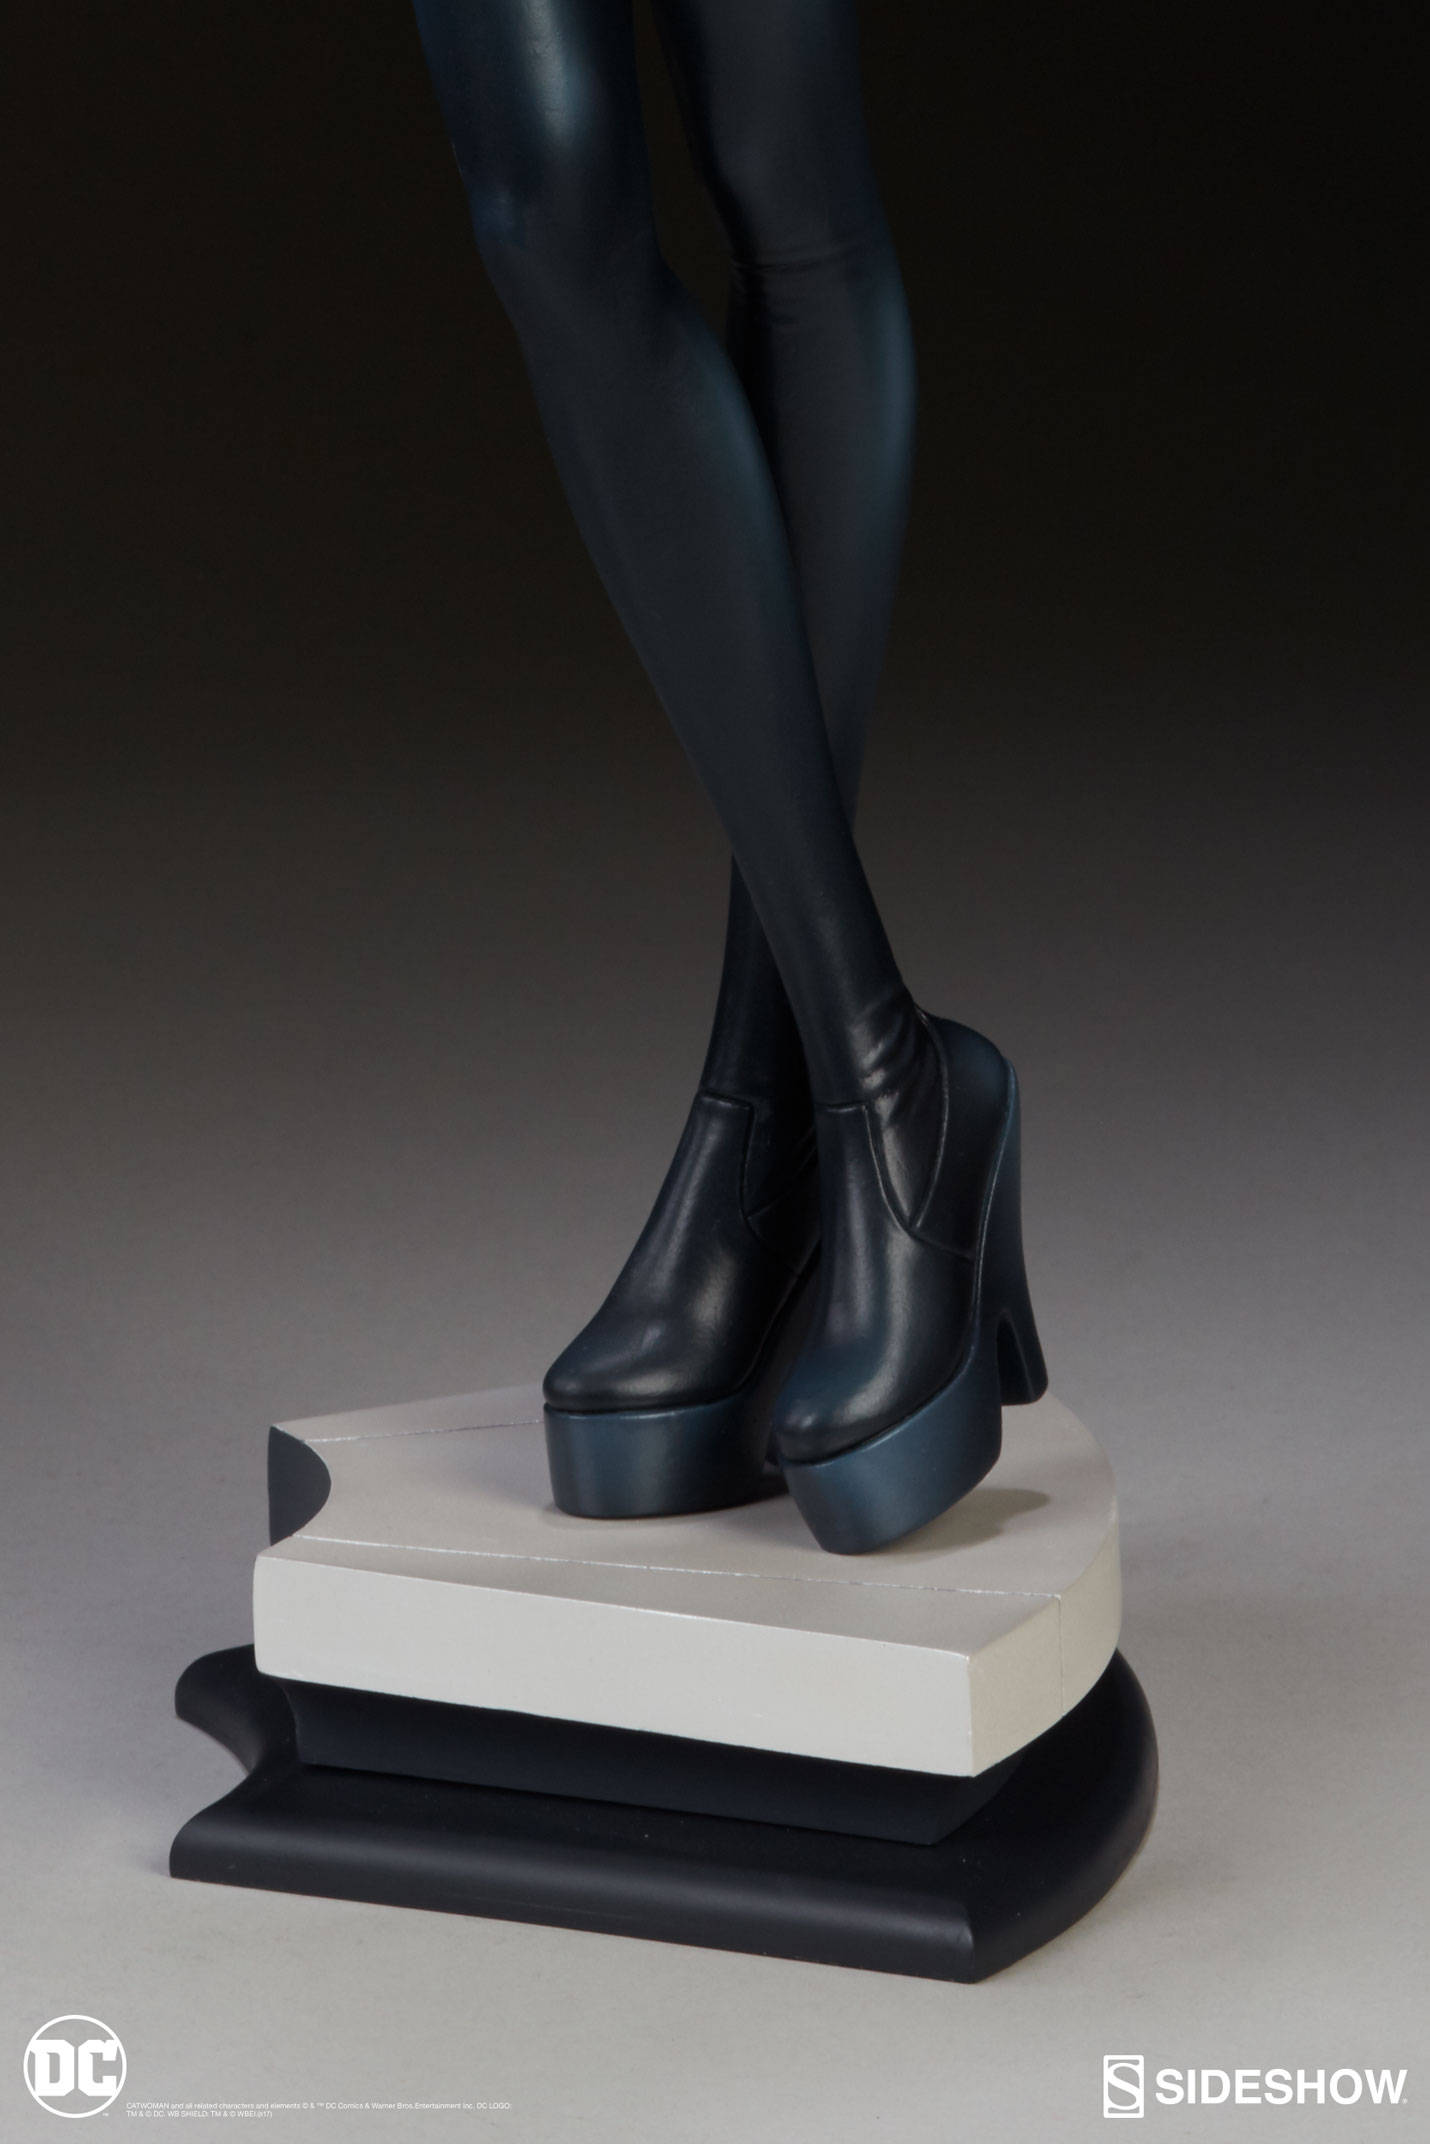 Catwoman-Sideshow-Artgerm-Statue13